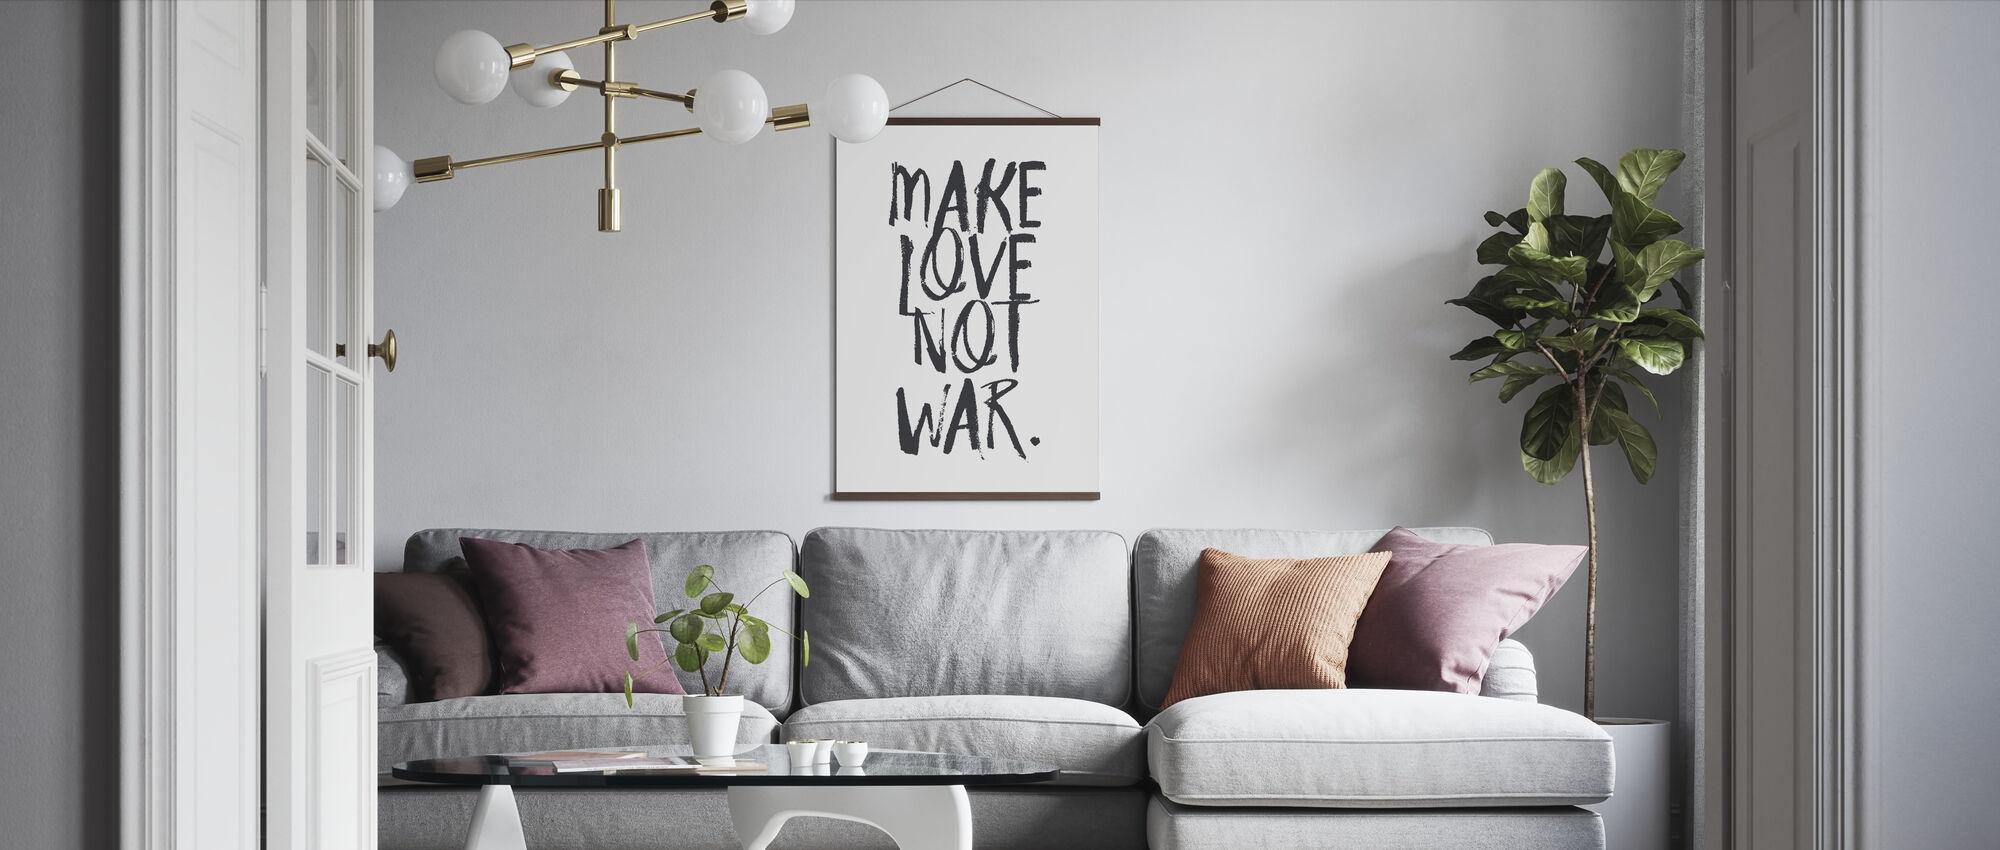 Make Love Not War - Poster - Living Room